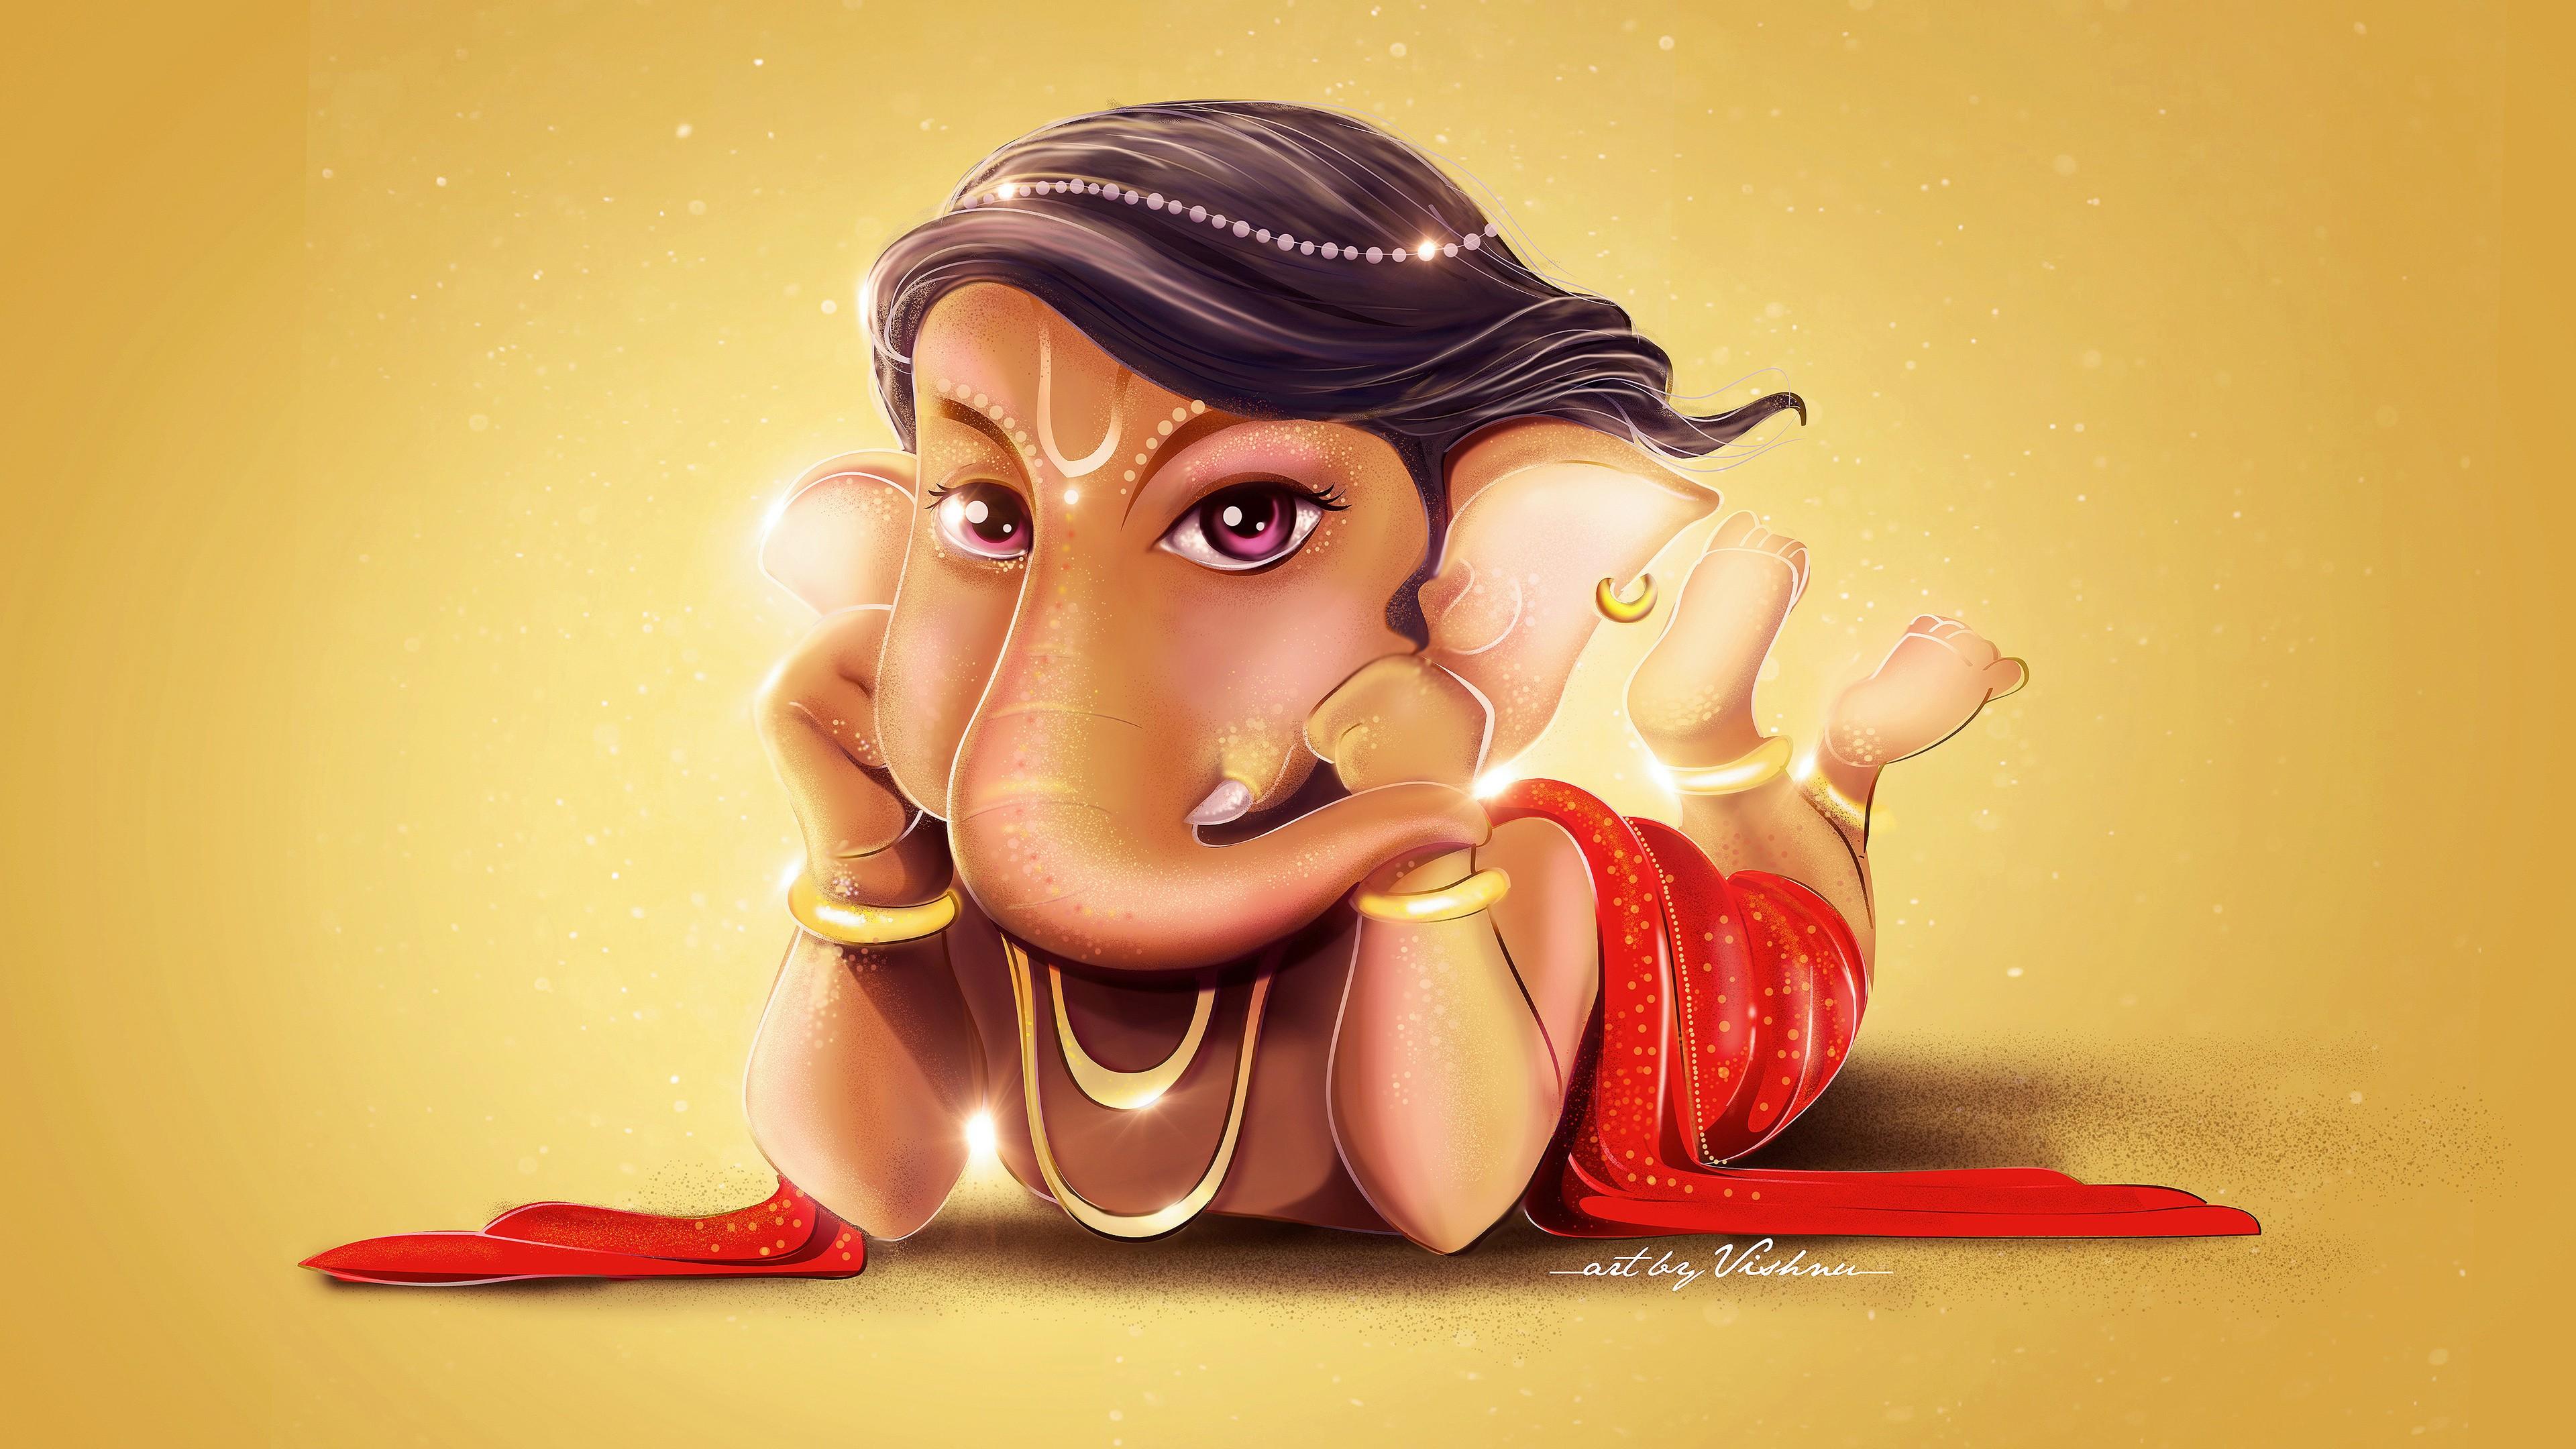 Cute Baby Girl Wallpaper For Desktop Full Screen Cute Lord Ganesha Hd 4k Wallpapers Hd Wallpapers Id 20942